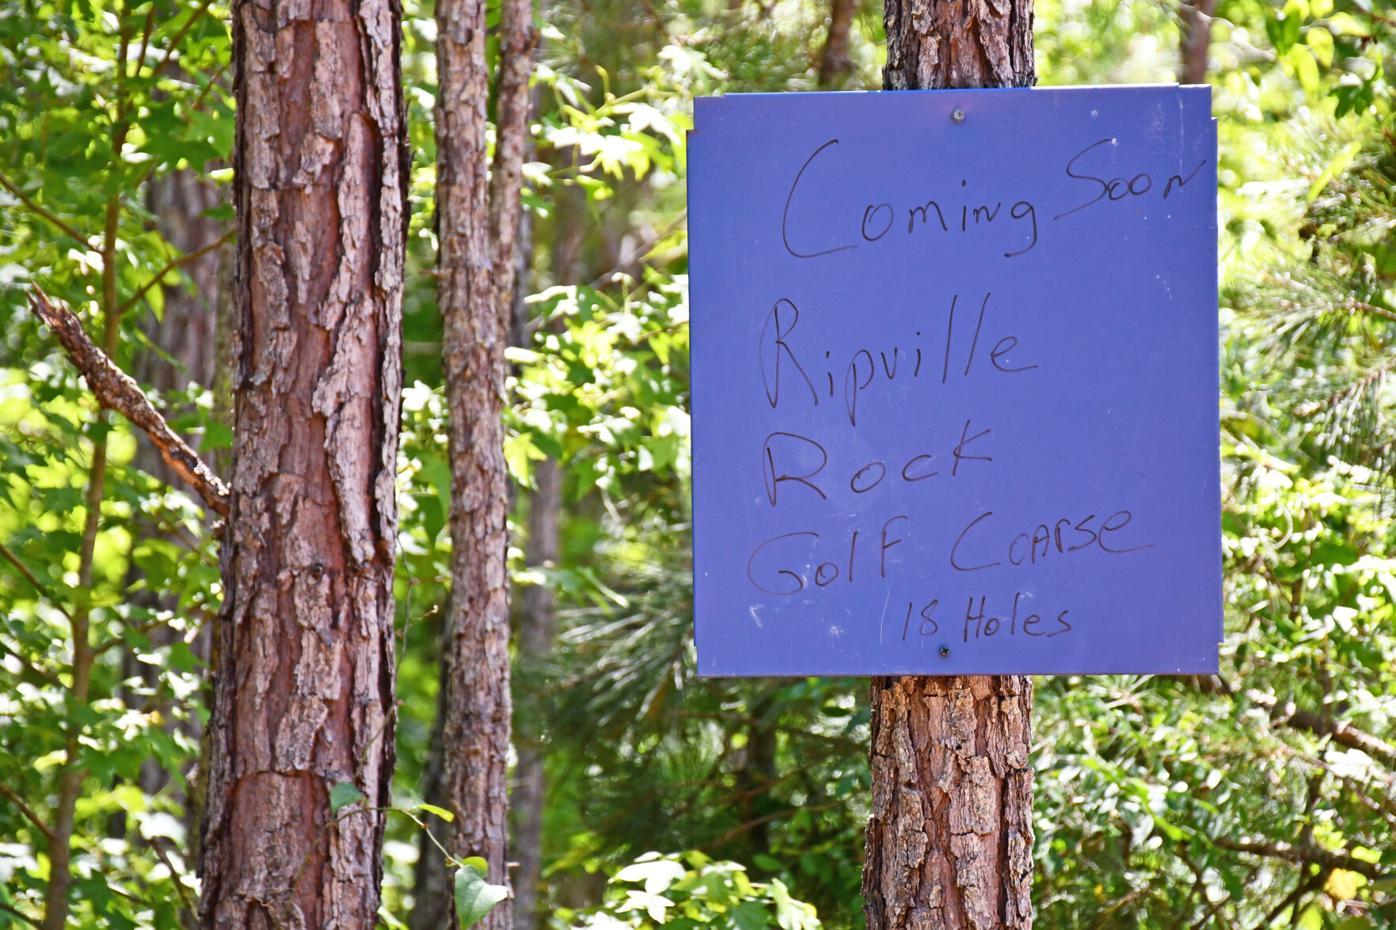 Ripville Rock Golf Coarse